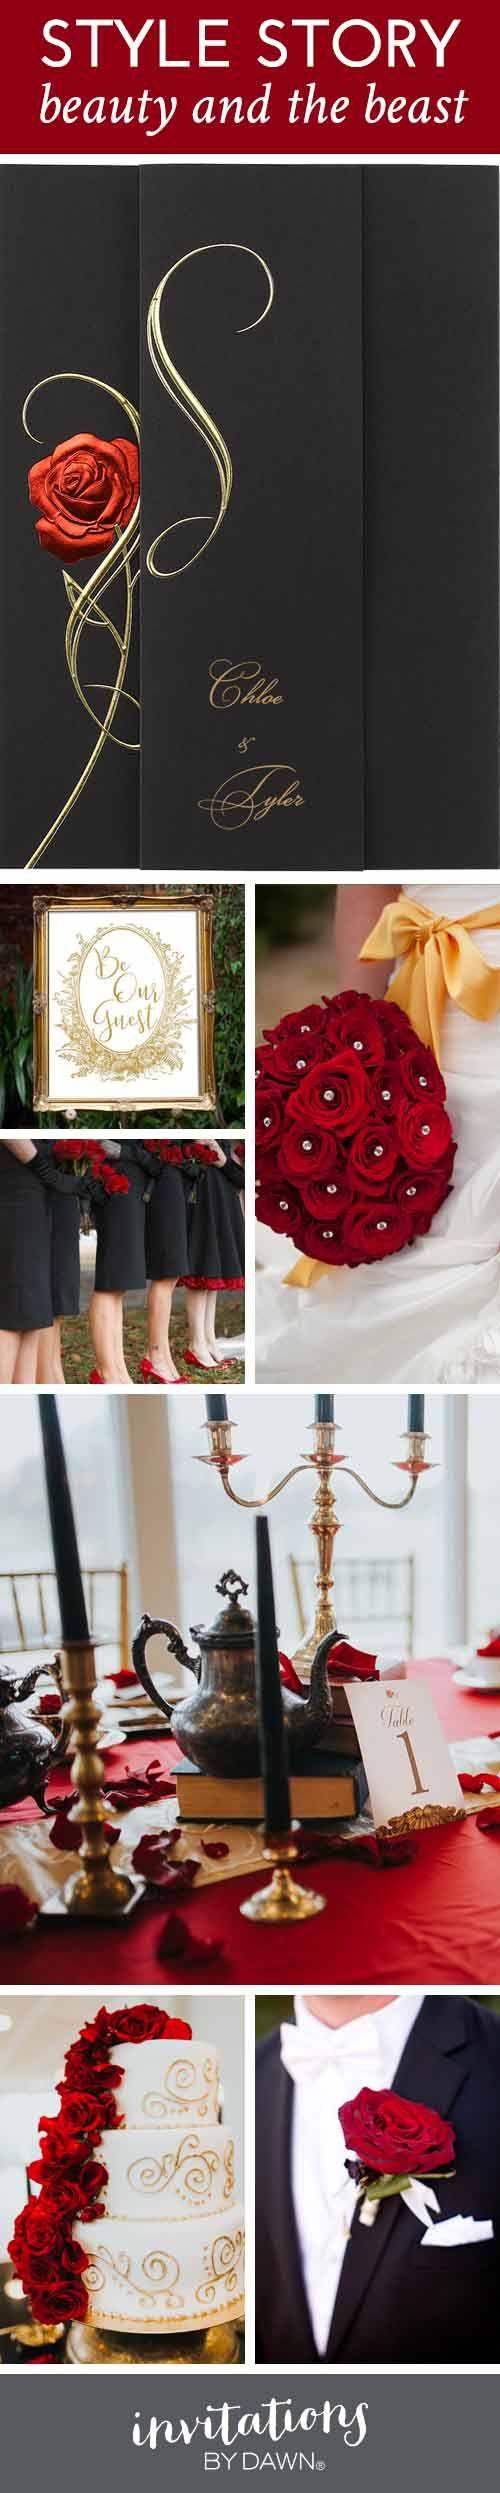 36 best Wedding Tips images on Pinterest | Wedding tips, Wedding ...